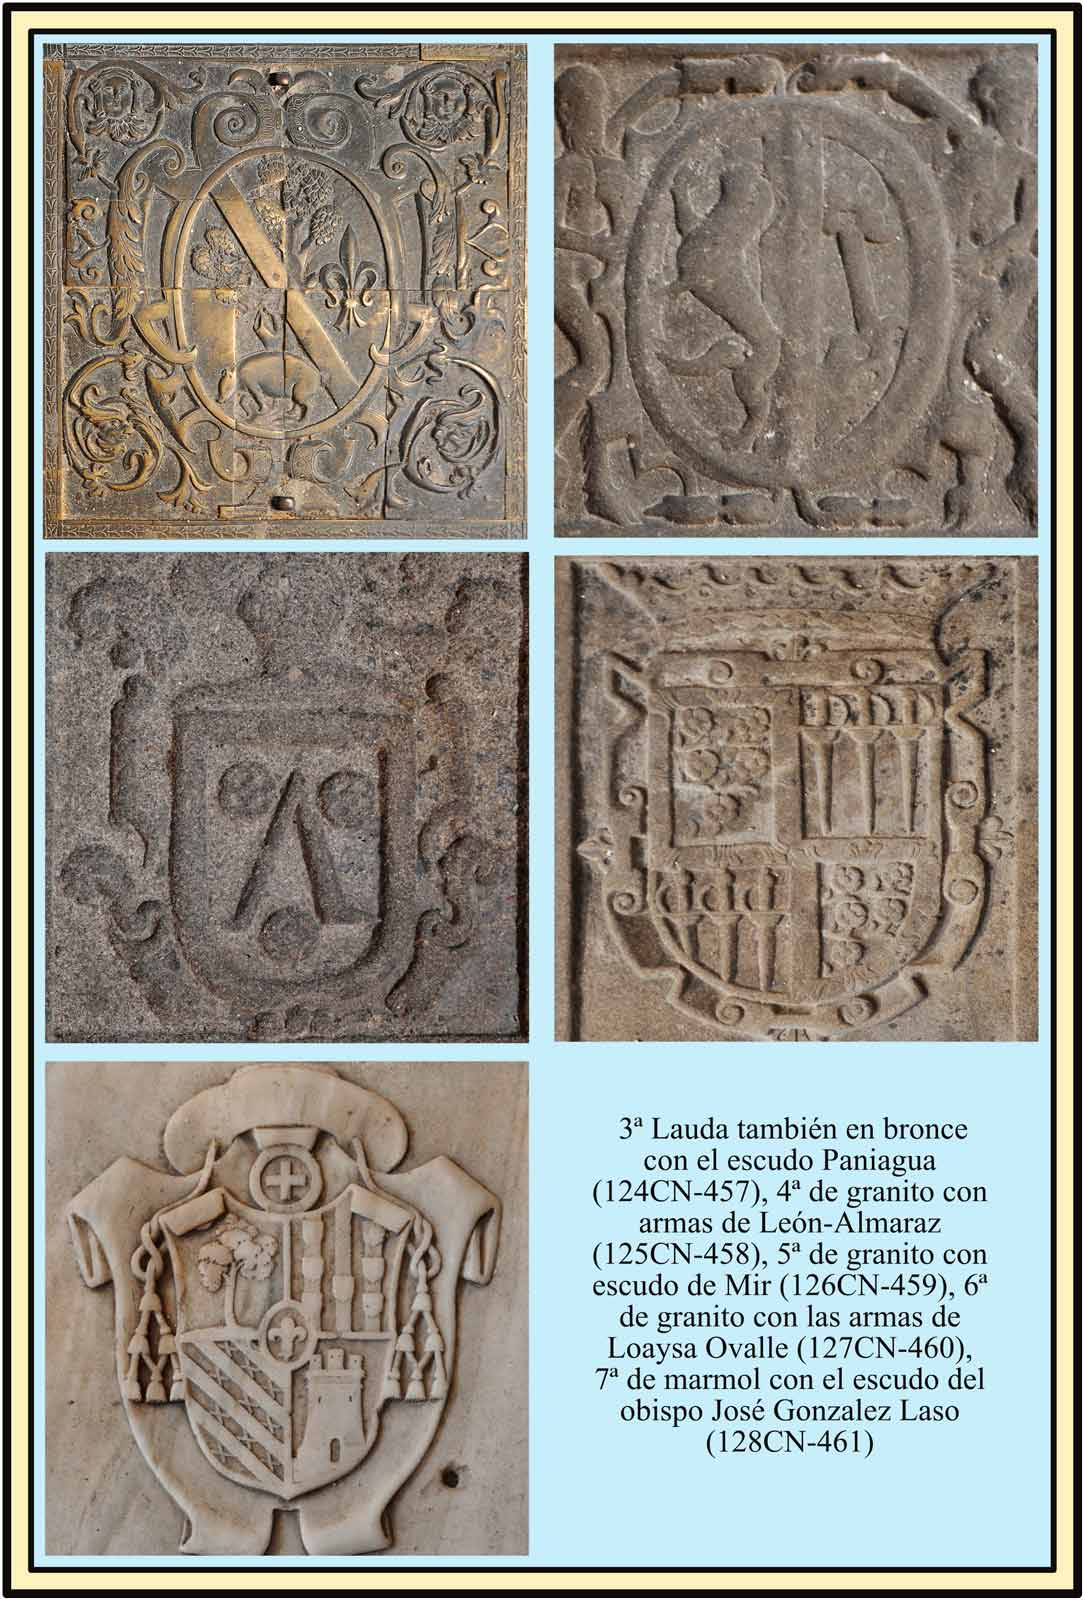 Lapidas sepulcrales con escudos Paniagua Leon Almaraz Mir Laso Ovalle